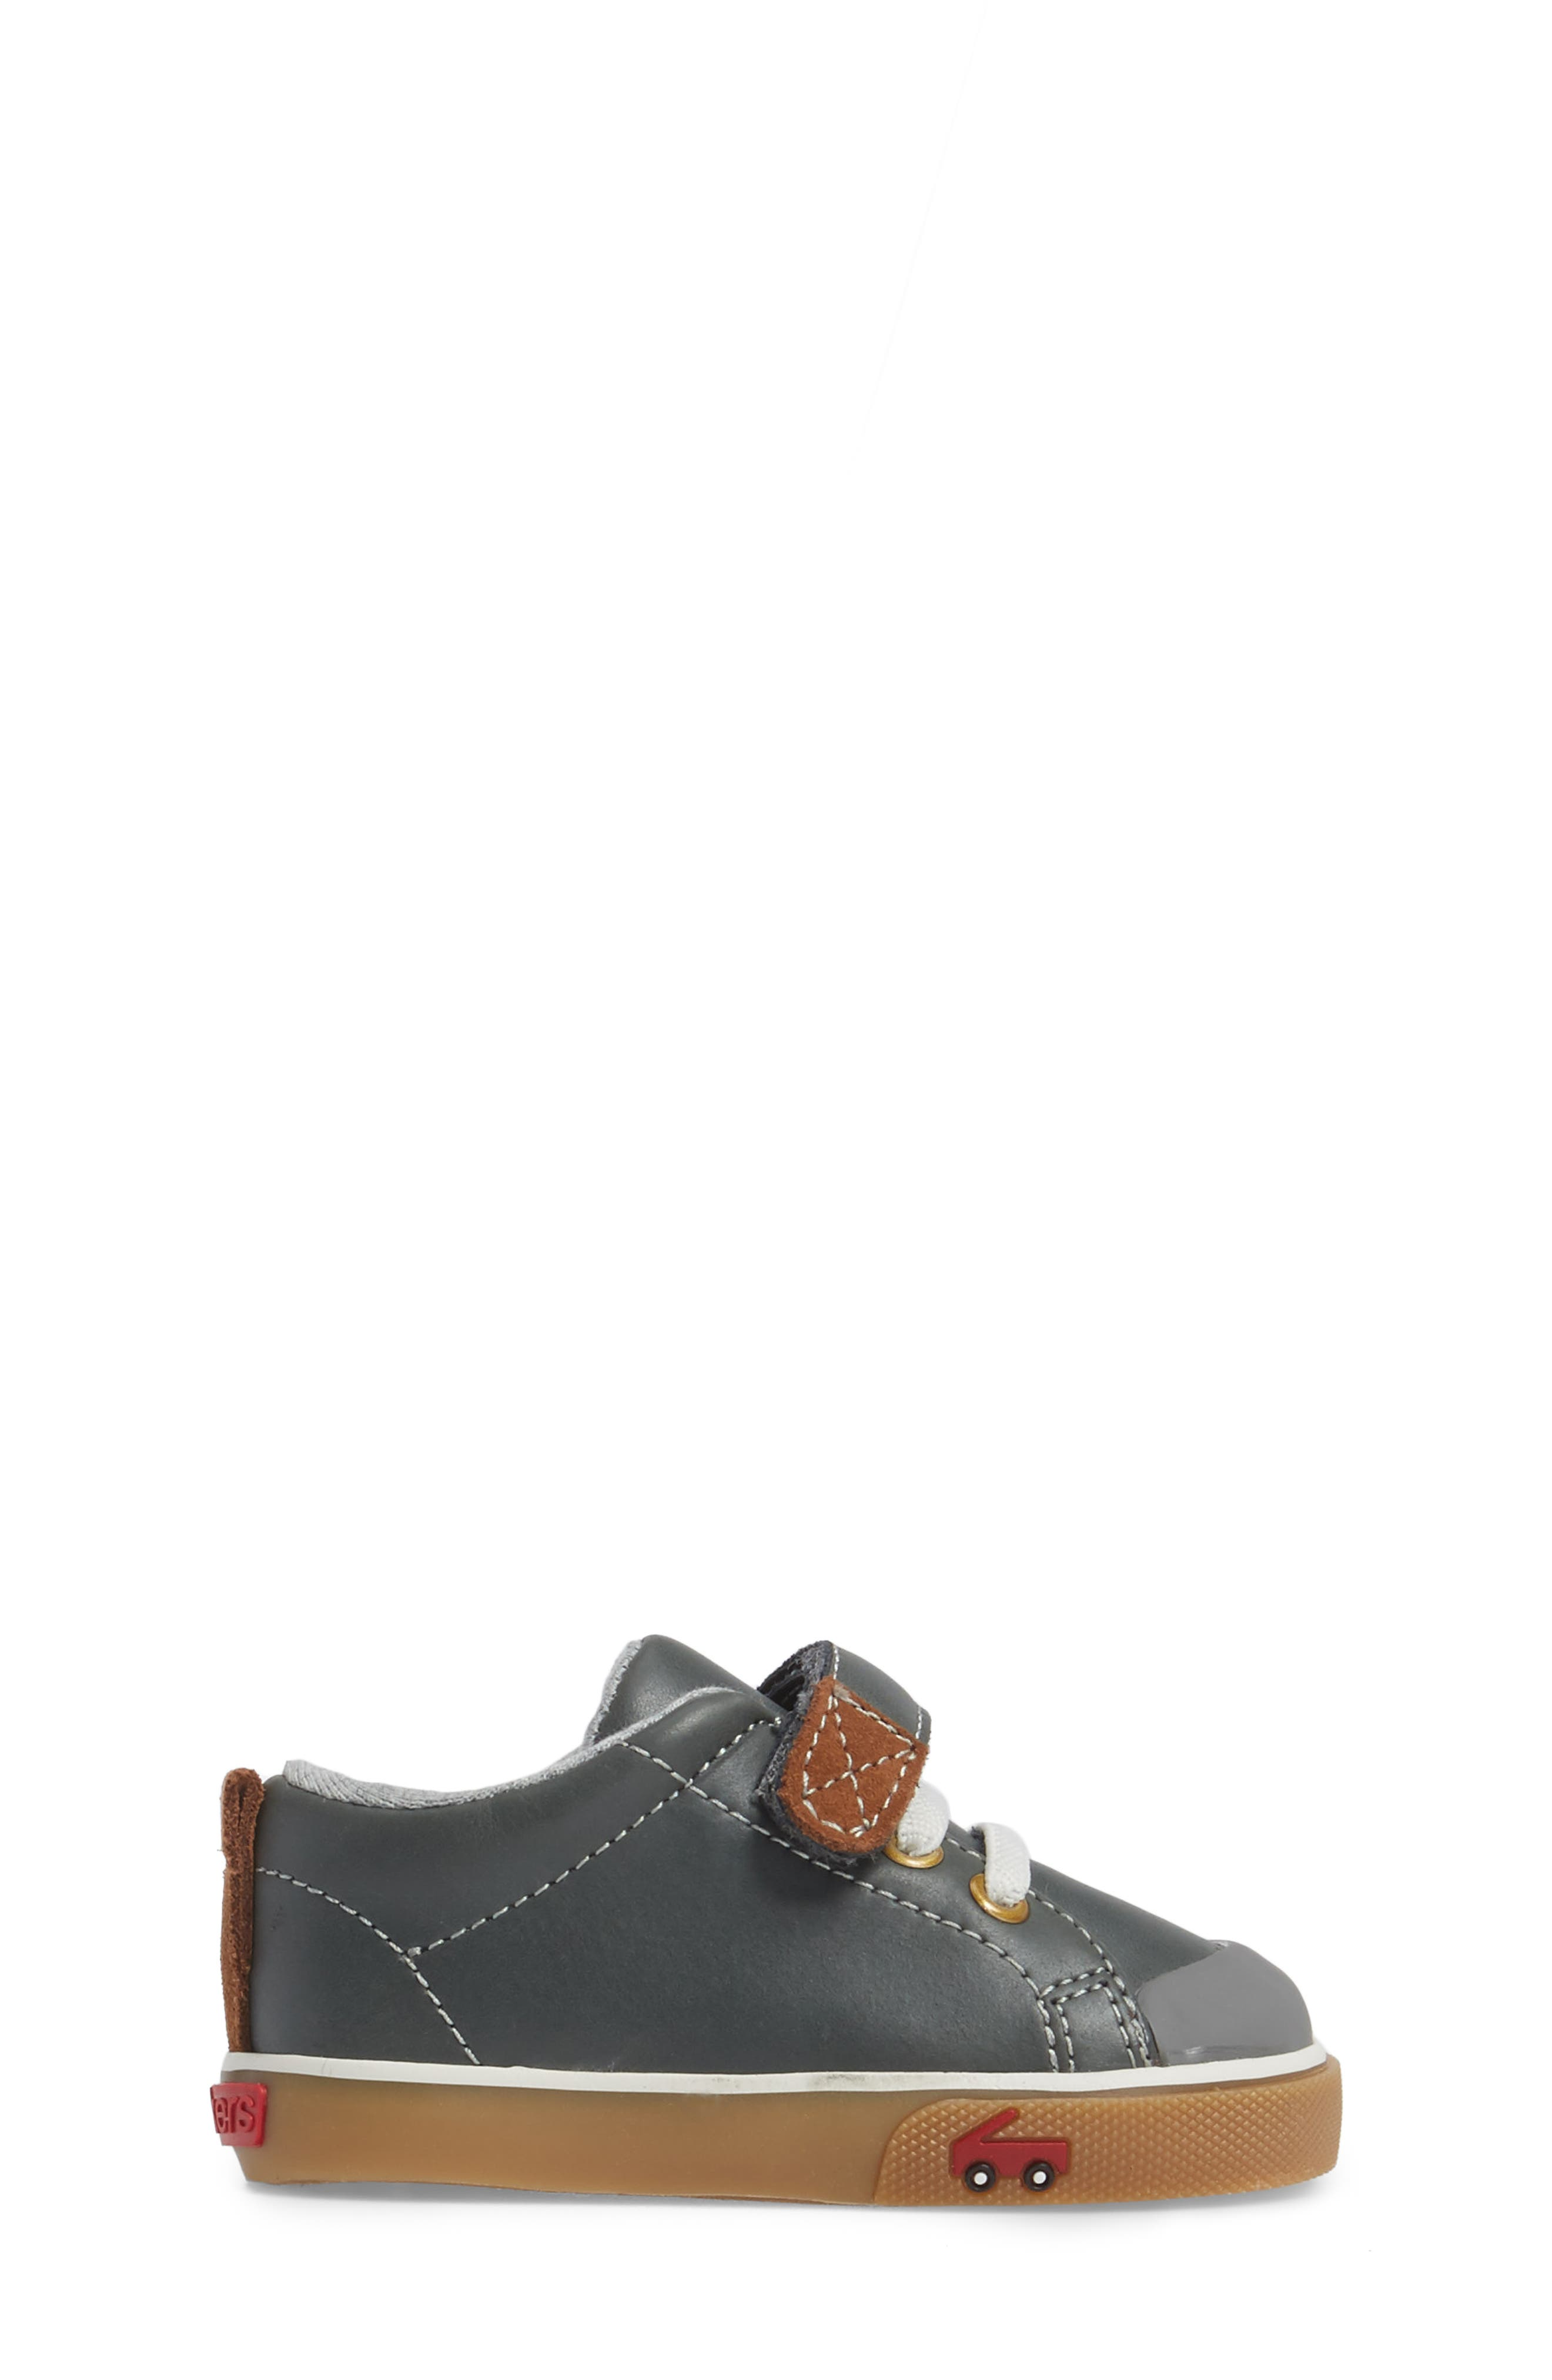 Stevie II Sneaker,                             Alternate thumbnail 3, color,                             GREY LEATHER